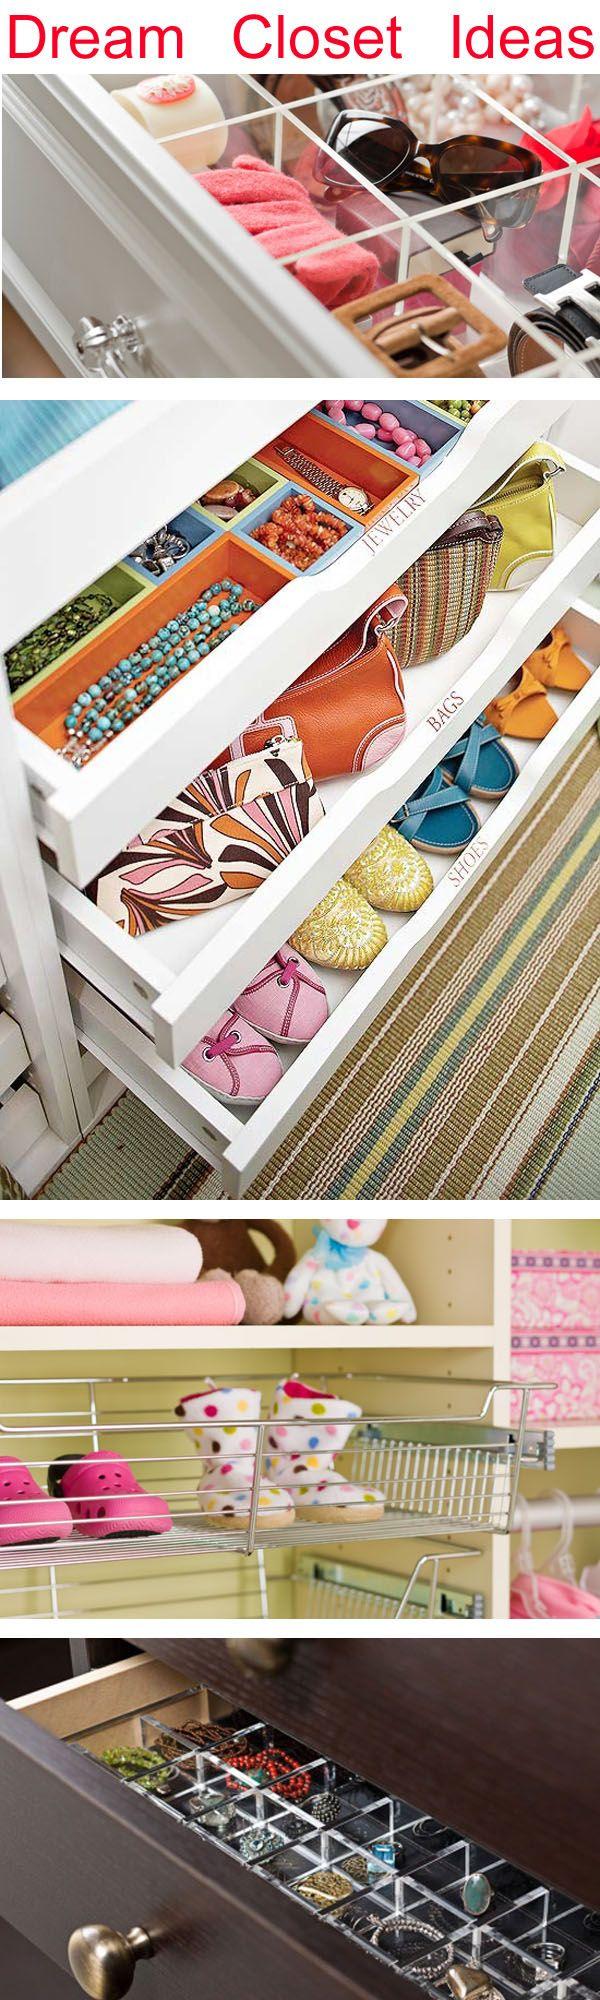 101 best DIY Closet Organization images on Pinterest | Home ...